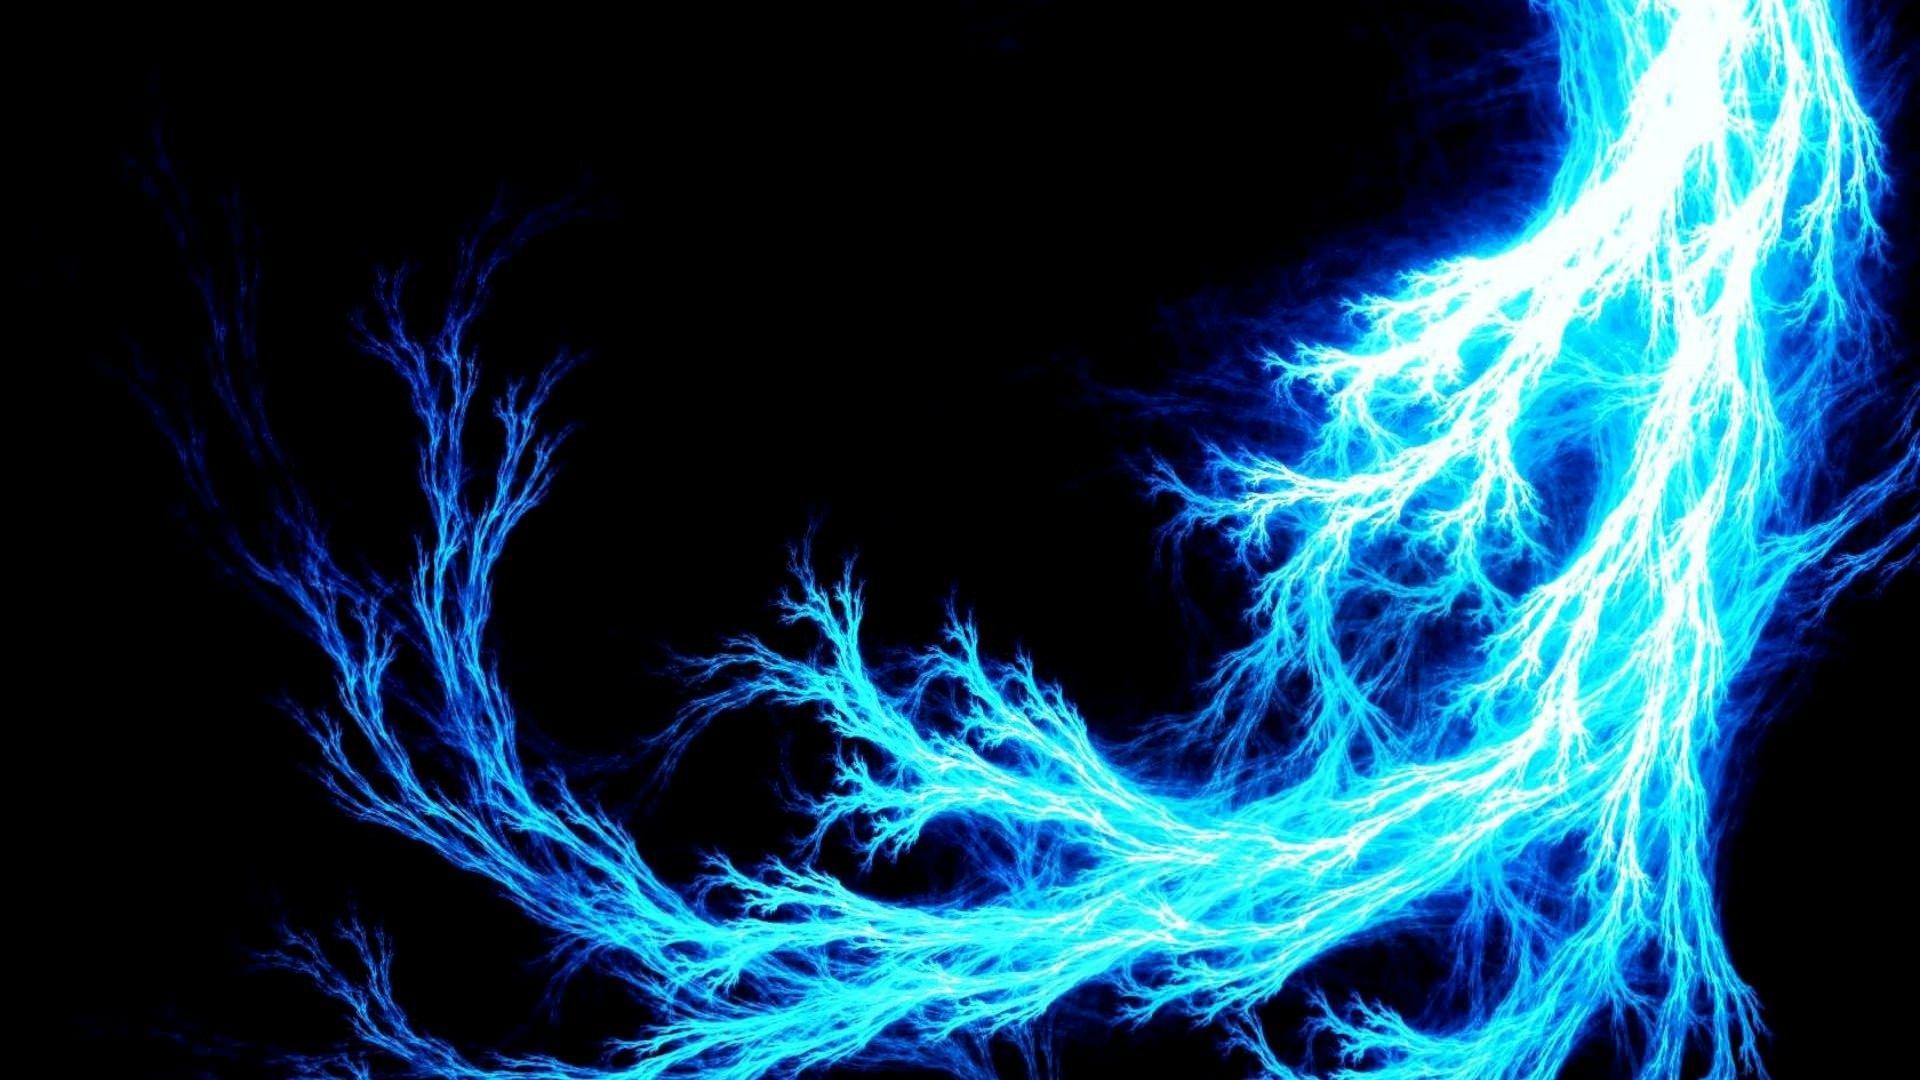 Lightning Bolt background wallpaper